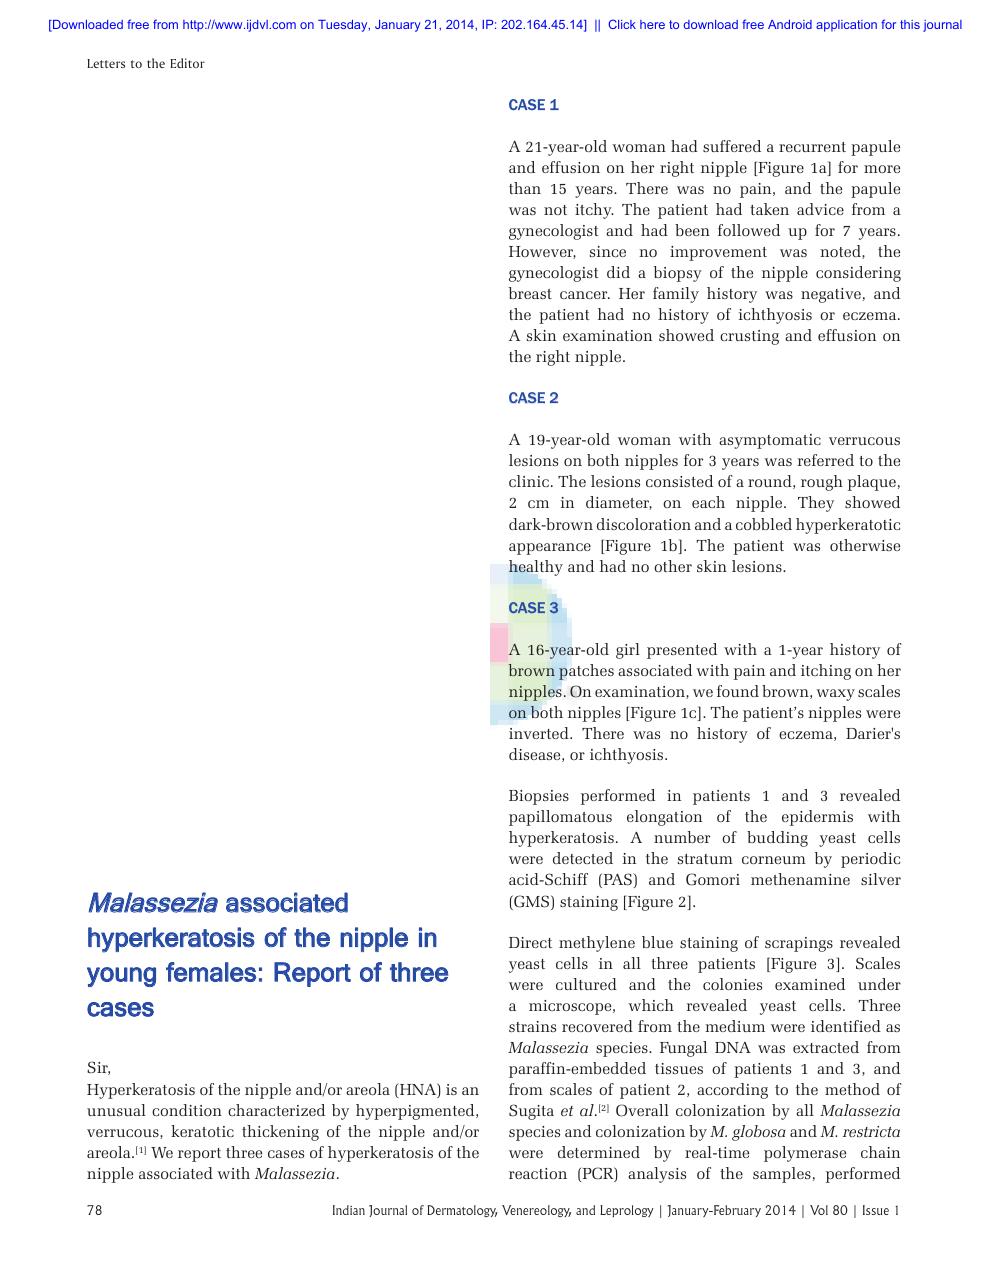 confluent and reticulated papillomatosis ijdvl)